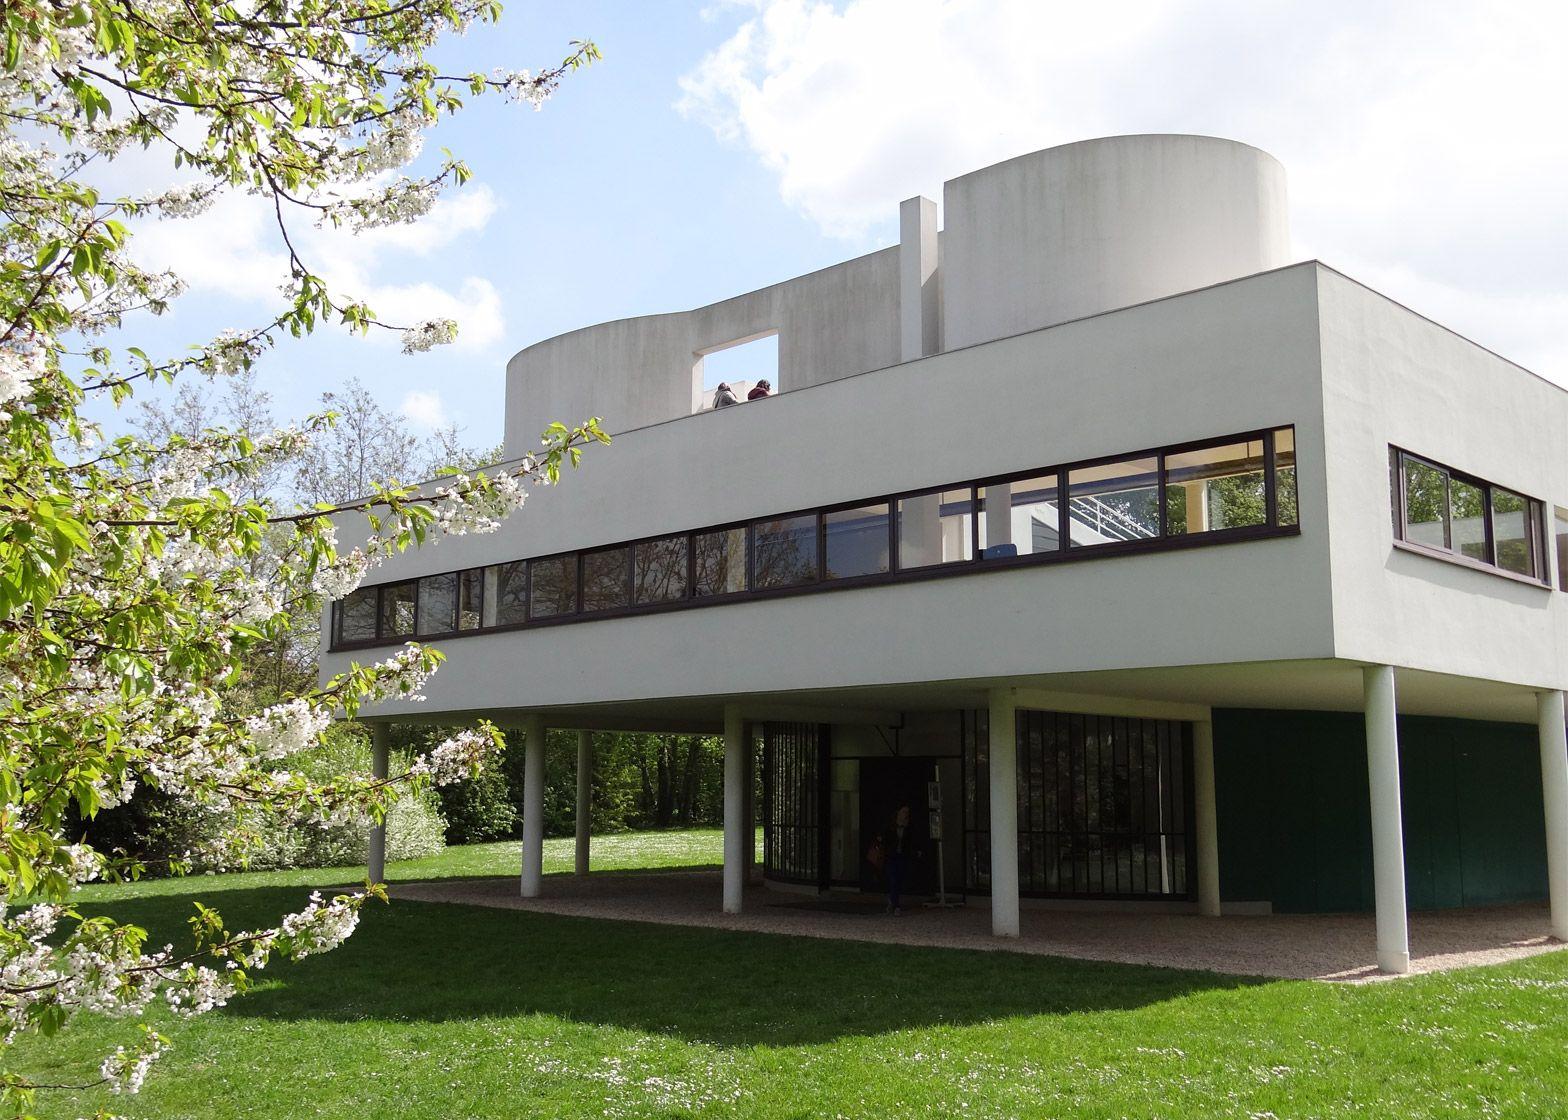 Le corbusier villa savoye interior - Le Corbusier S Villa Savoye Encapsulates The Modernist Style